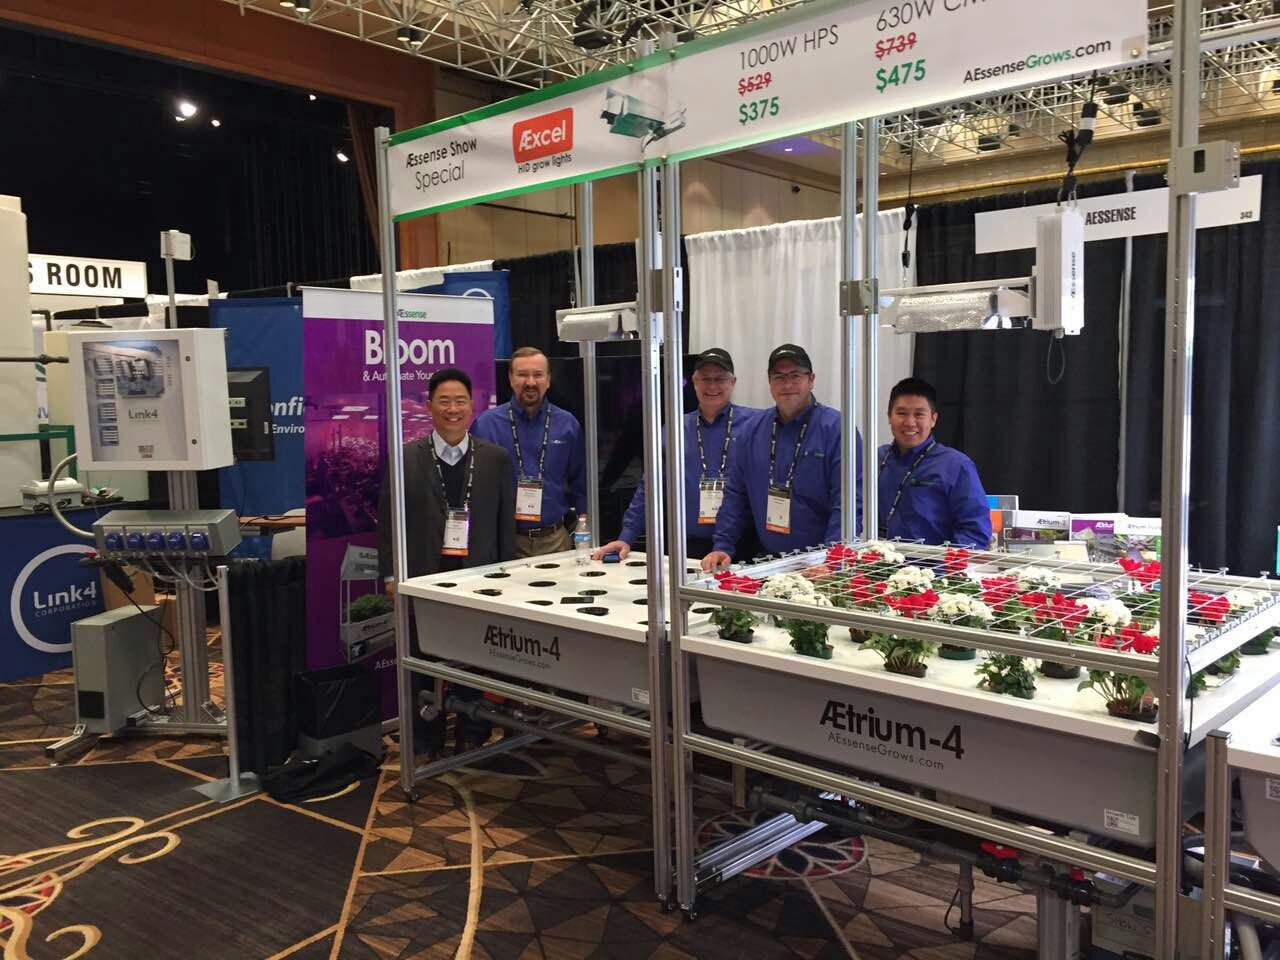 AEssense Attends 2016 Marijuana Business Conference in Las Vegas